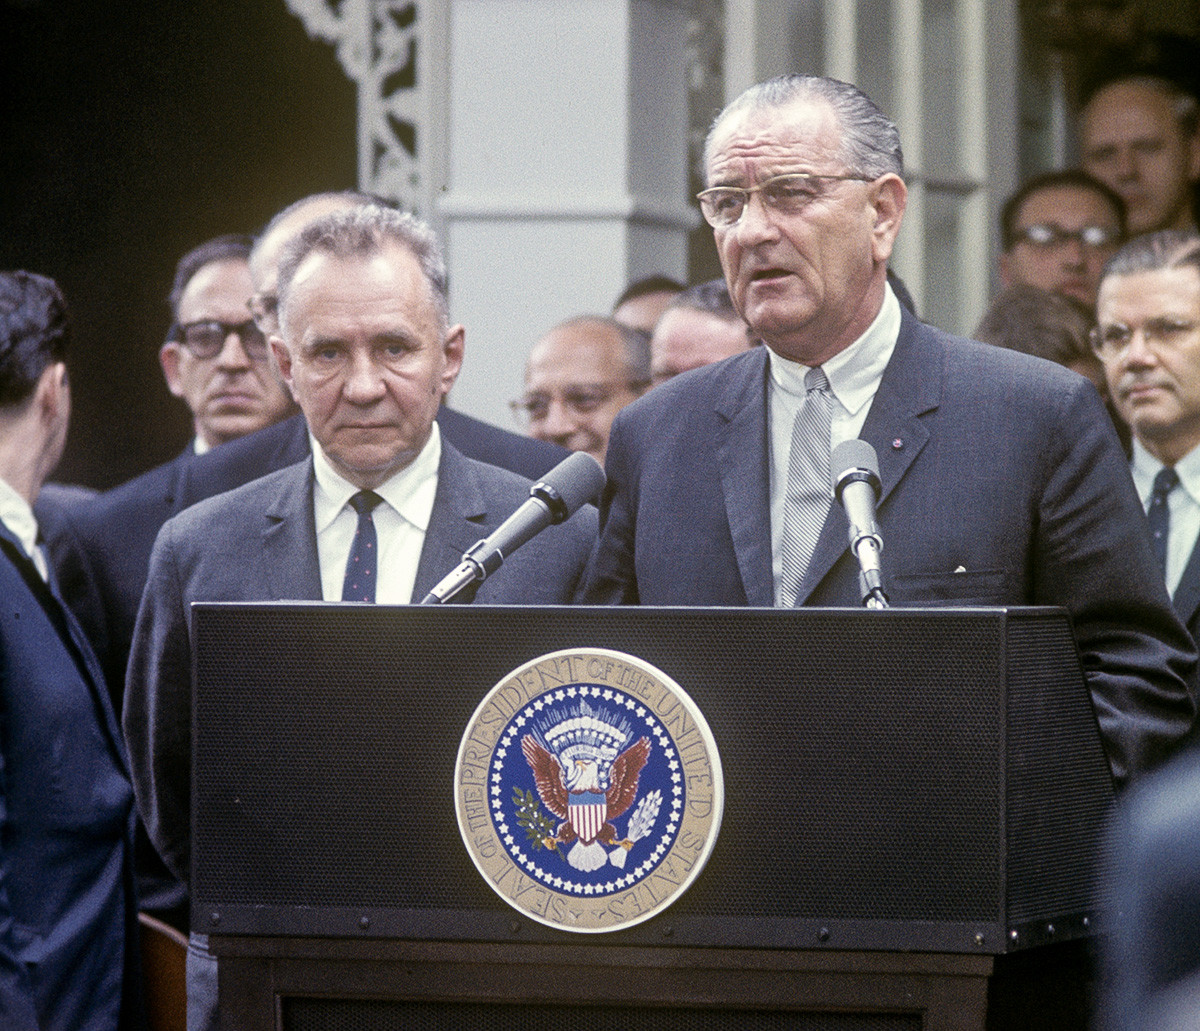 Alexei Kosygin and President Lyndon Johnson speaking at the podium at Glassboro Summit, Glassboro, NJ, June 1967